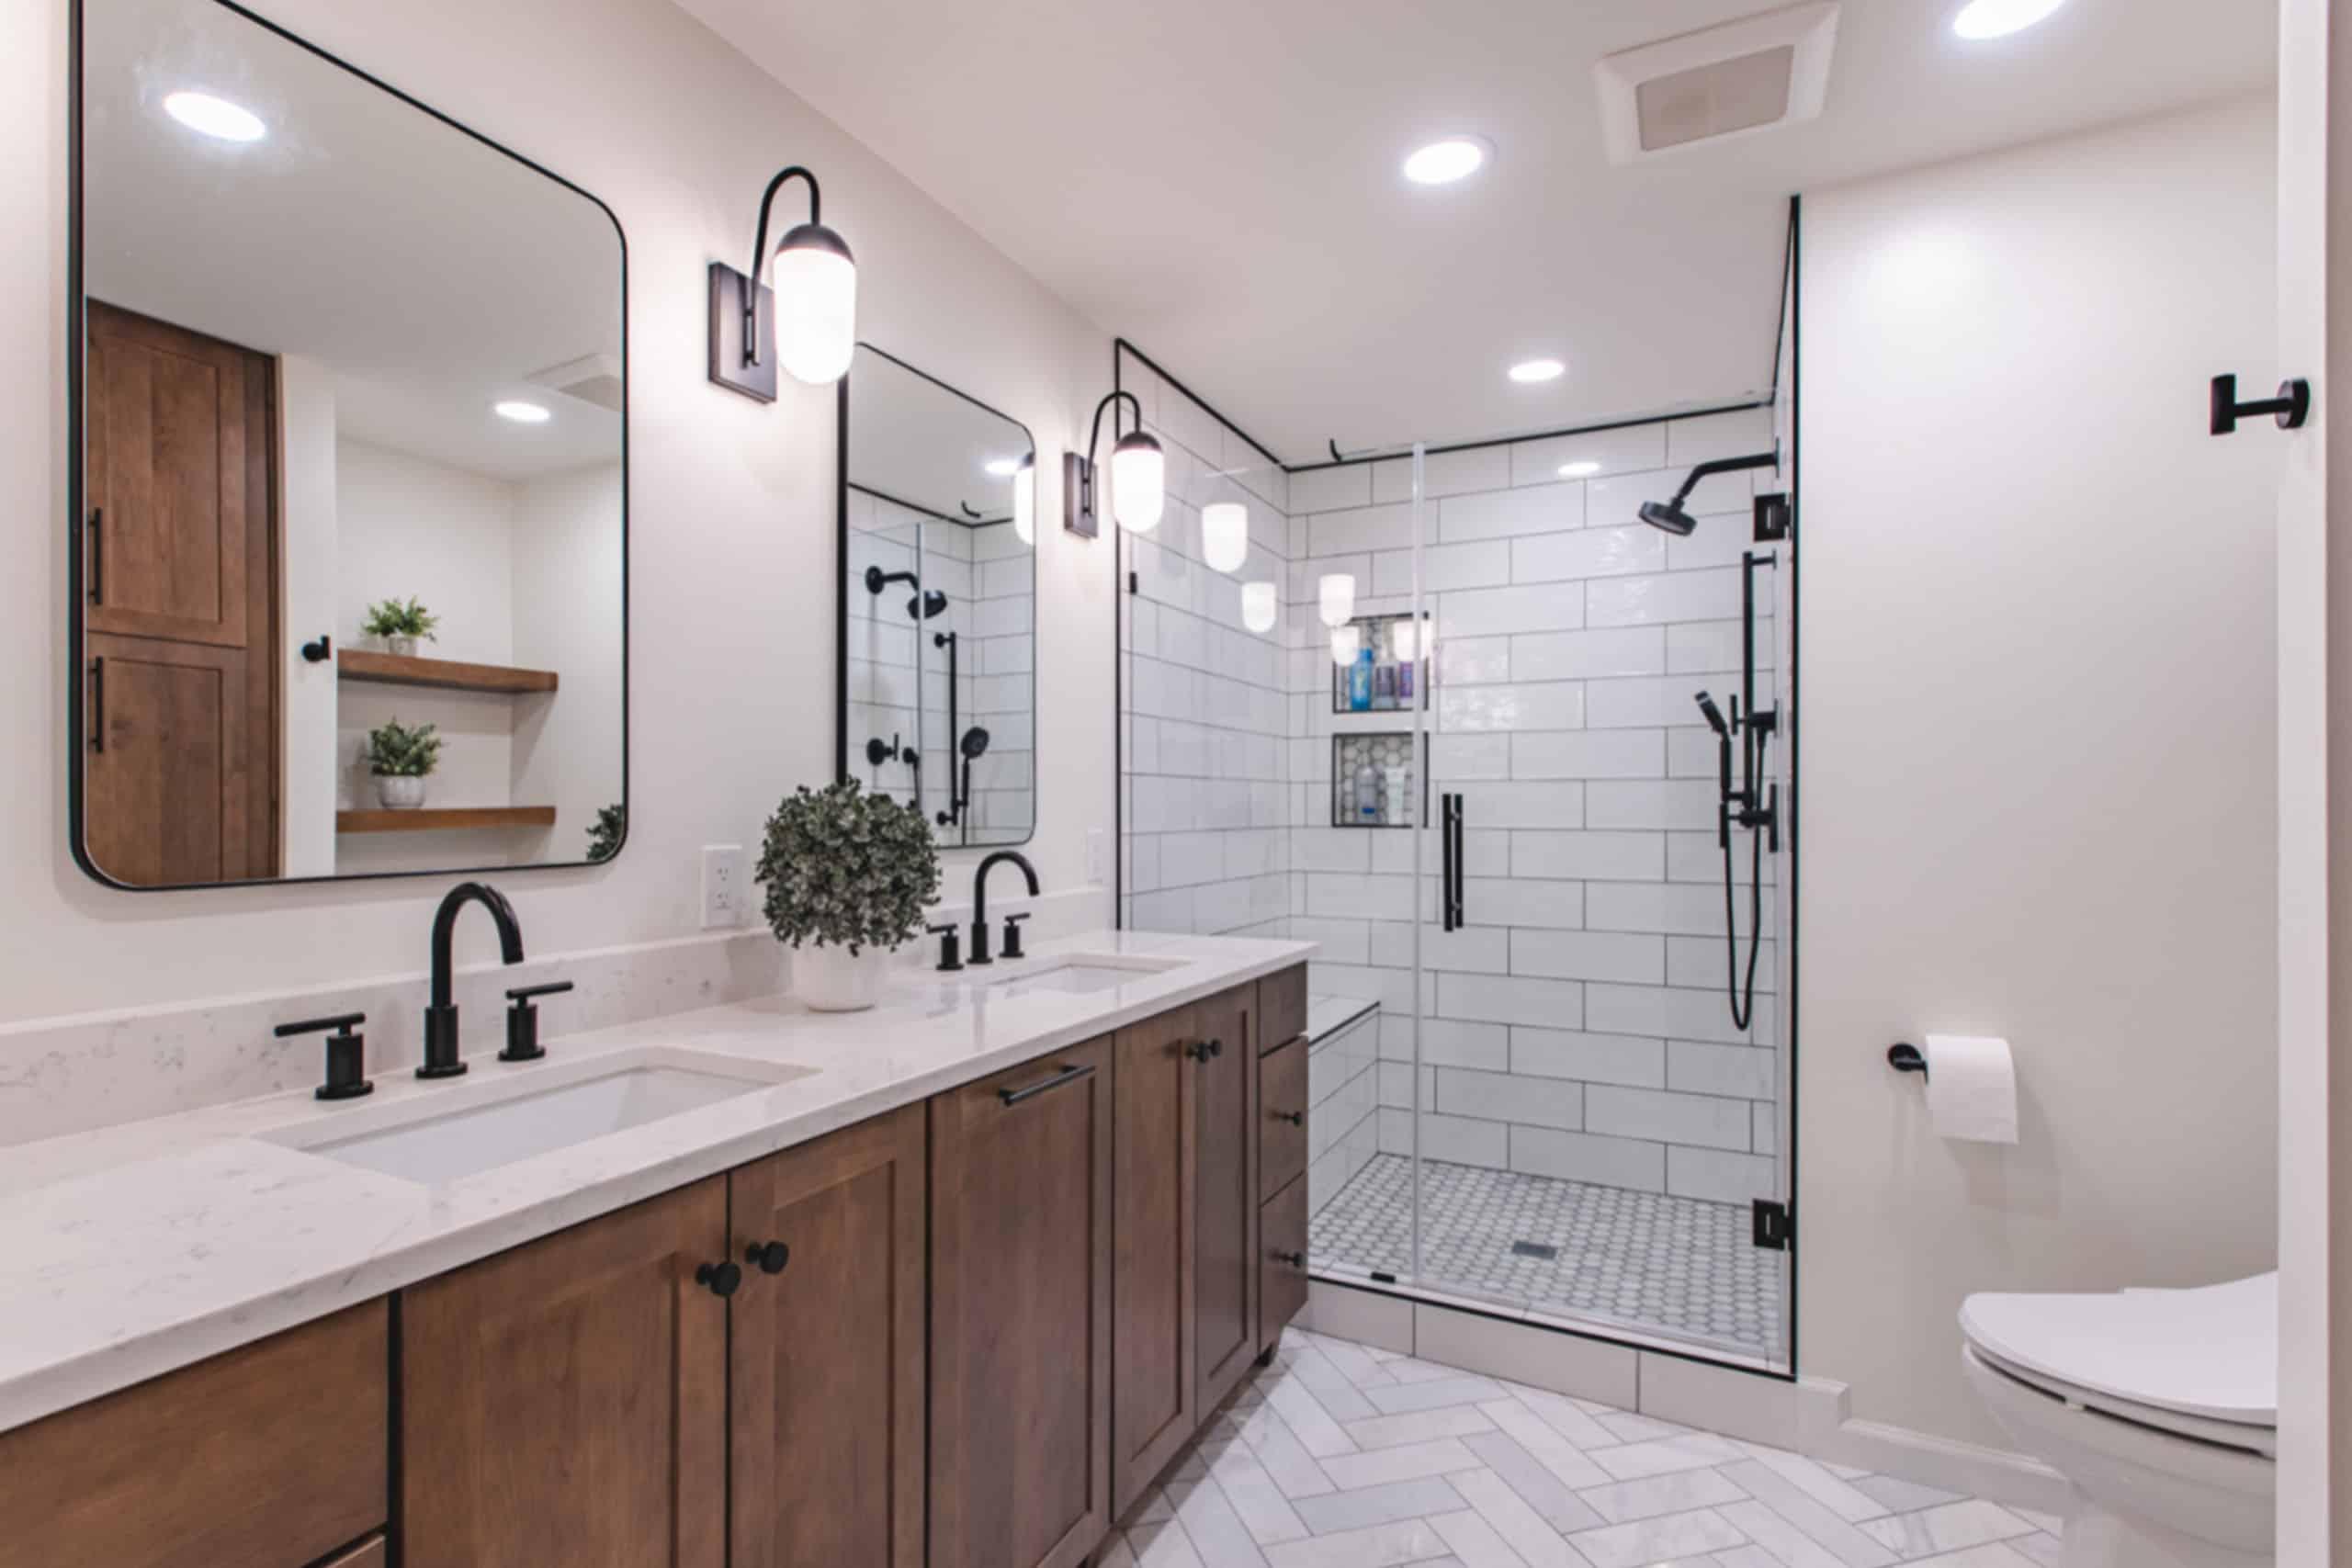 Fairfax KB Falls Church Bathroom